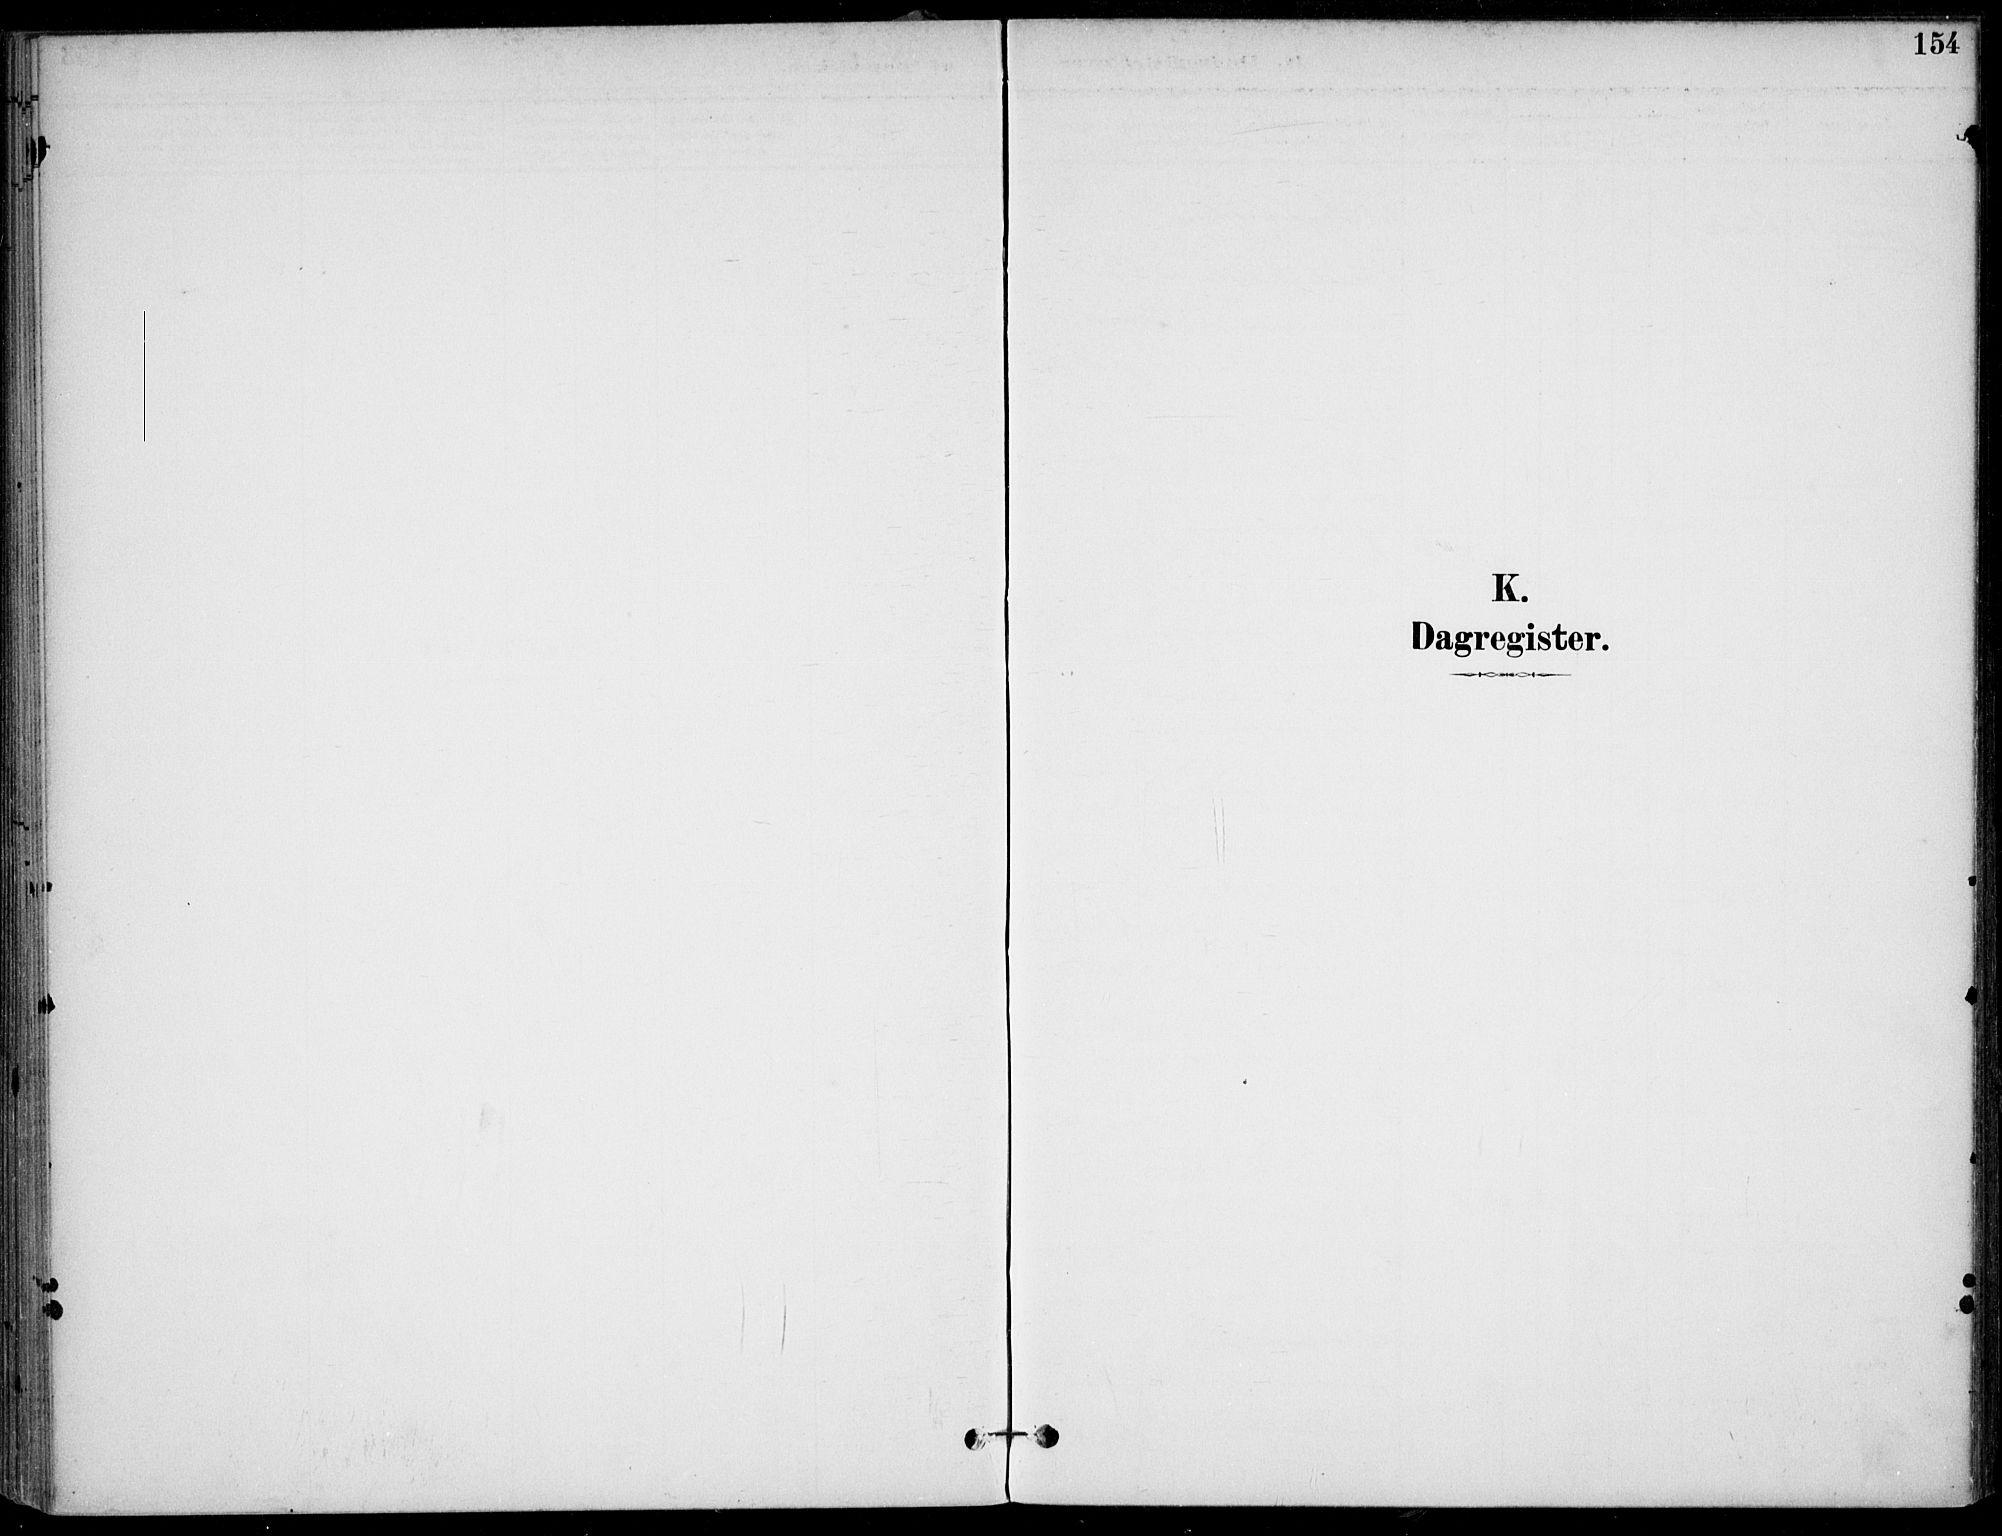 SAKO, Lunde kirkebøker, F/Fa/L0003: Ministerialbok nr. I 3, 1893-1902, s. 154